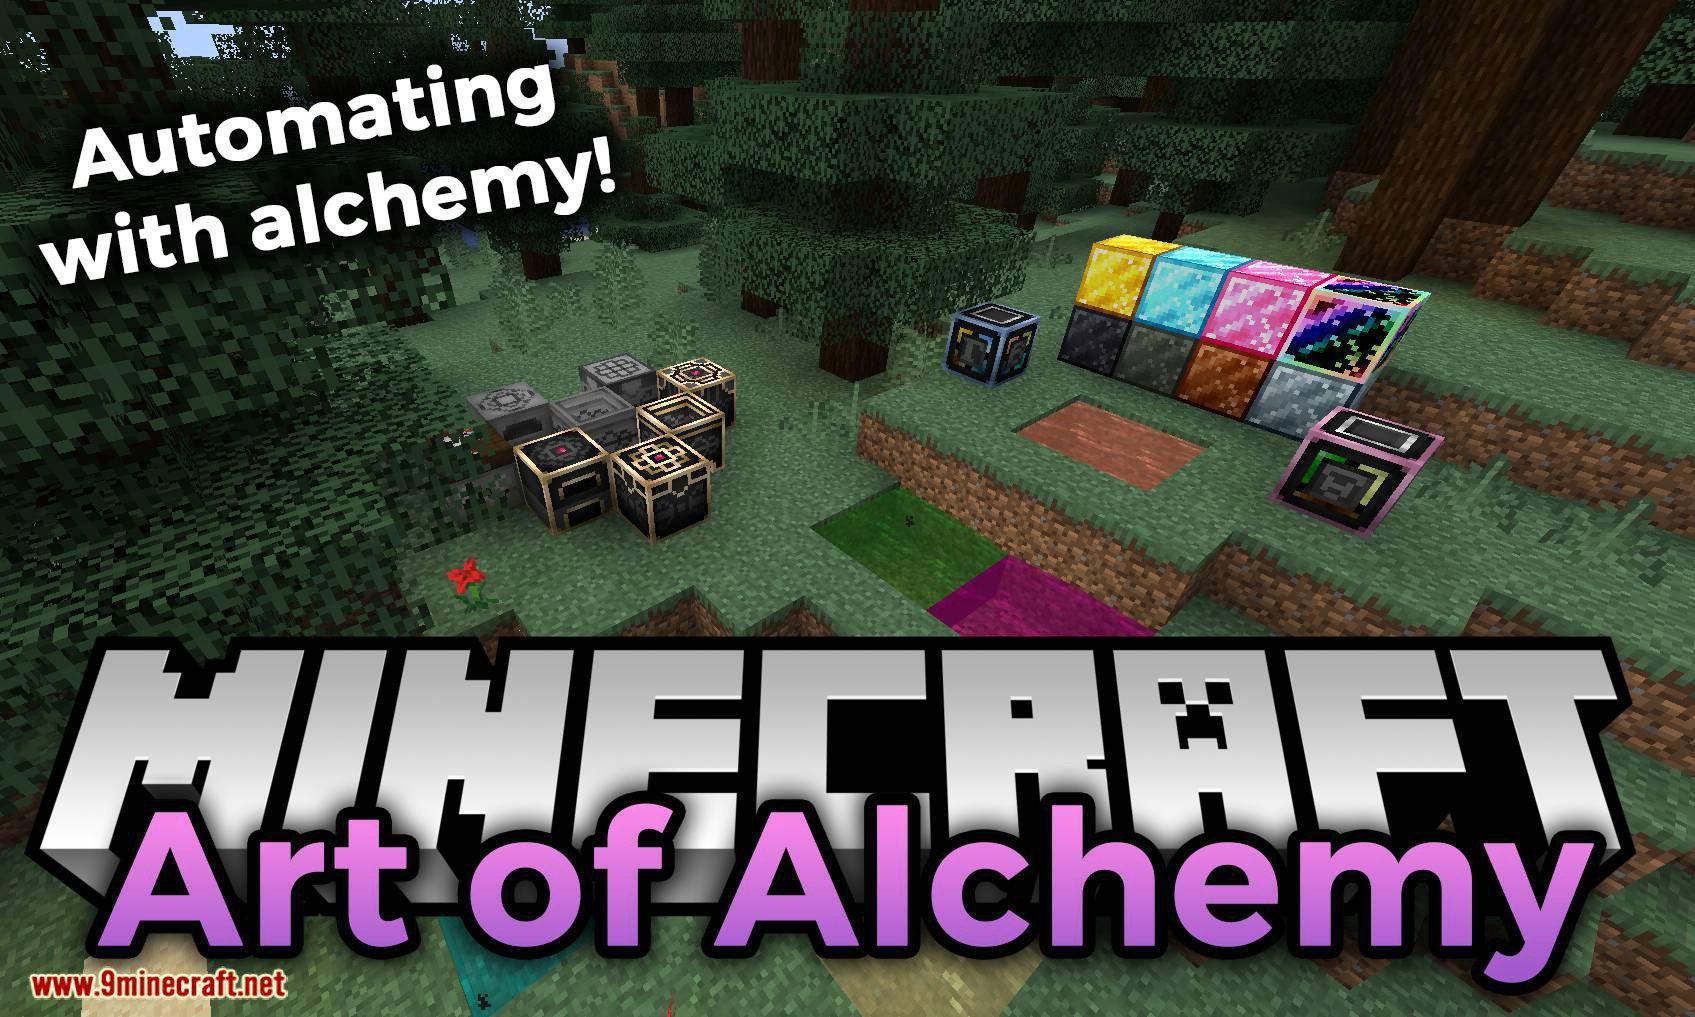 Art of Alchemy mod for minecraft logo